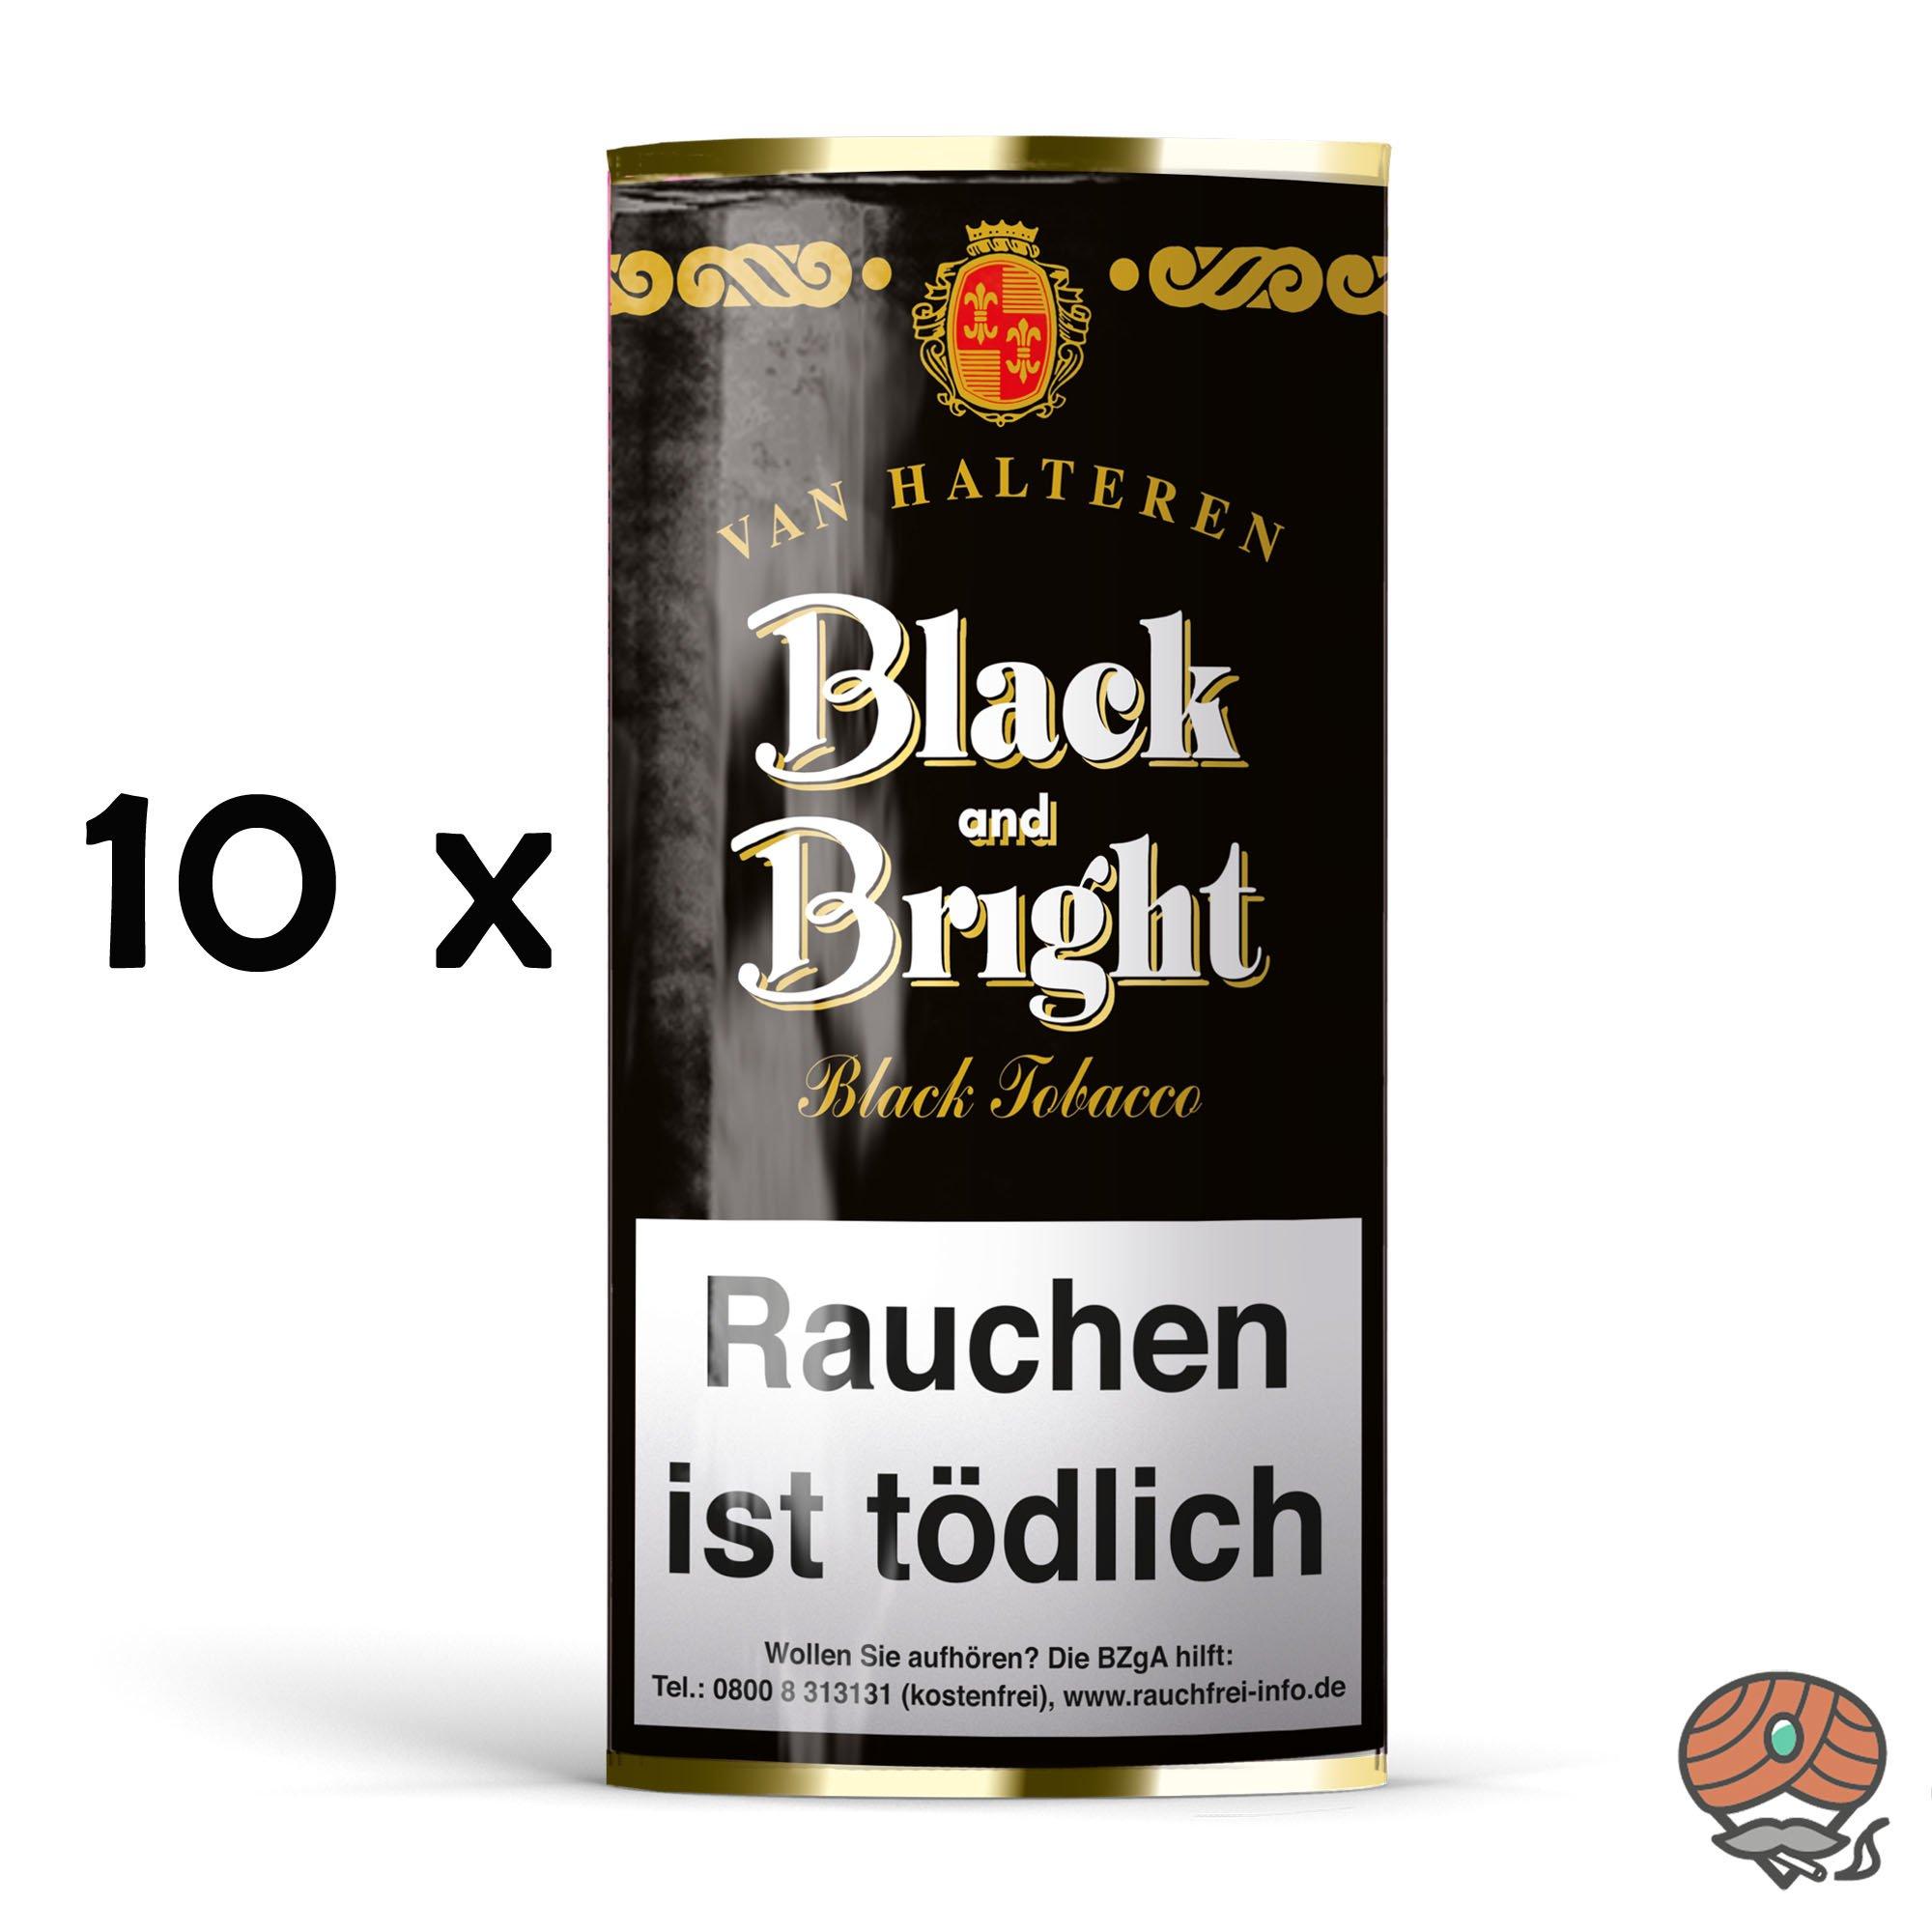 10x Van Halteren Black and Bright Pfeifentabak à 50g